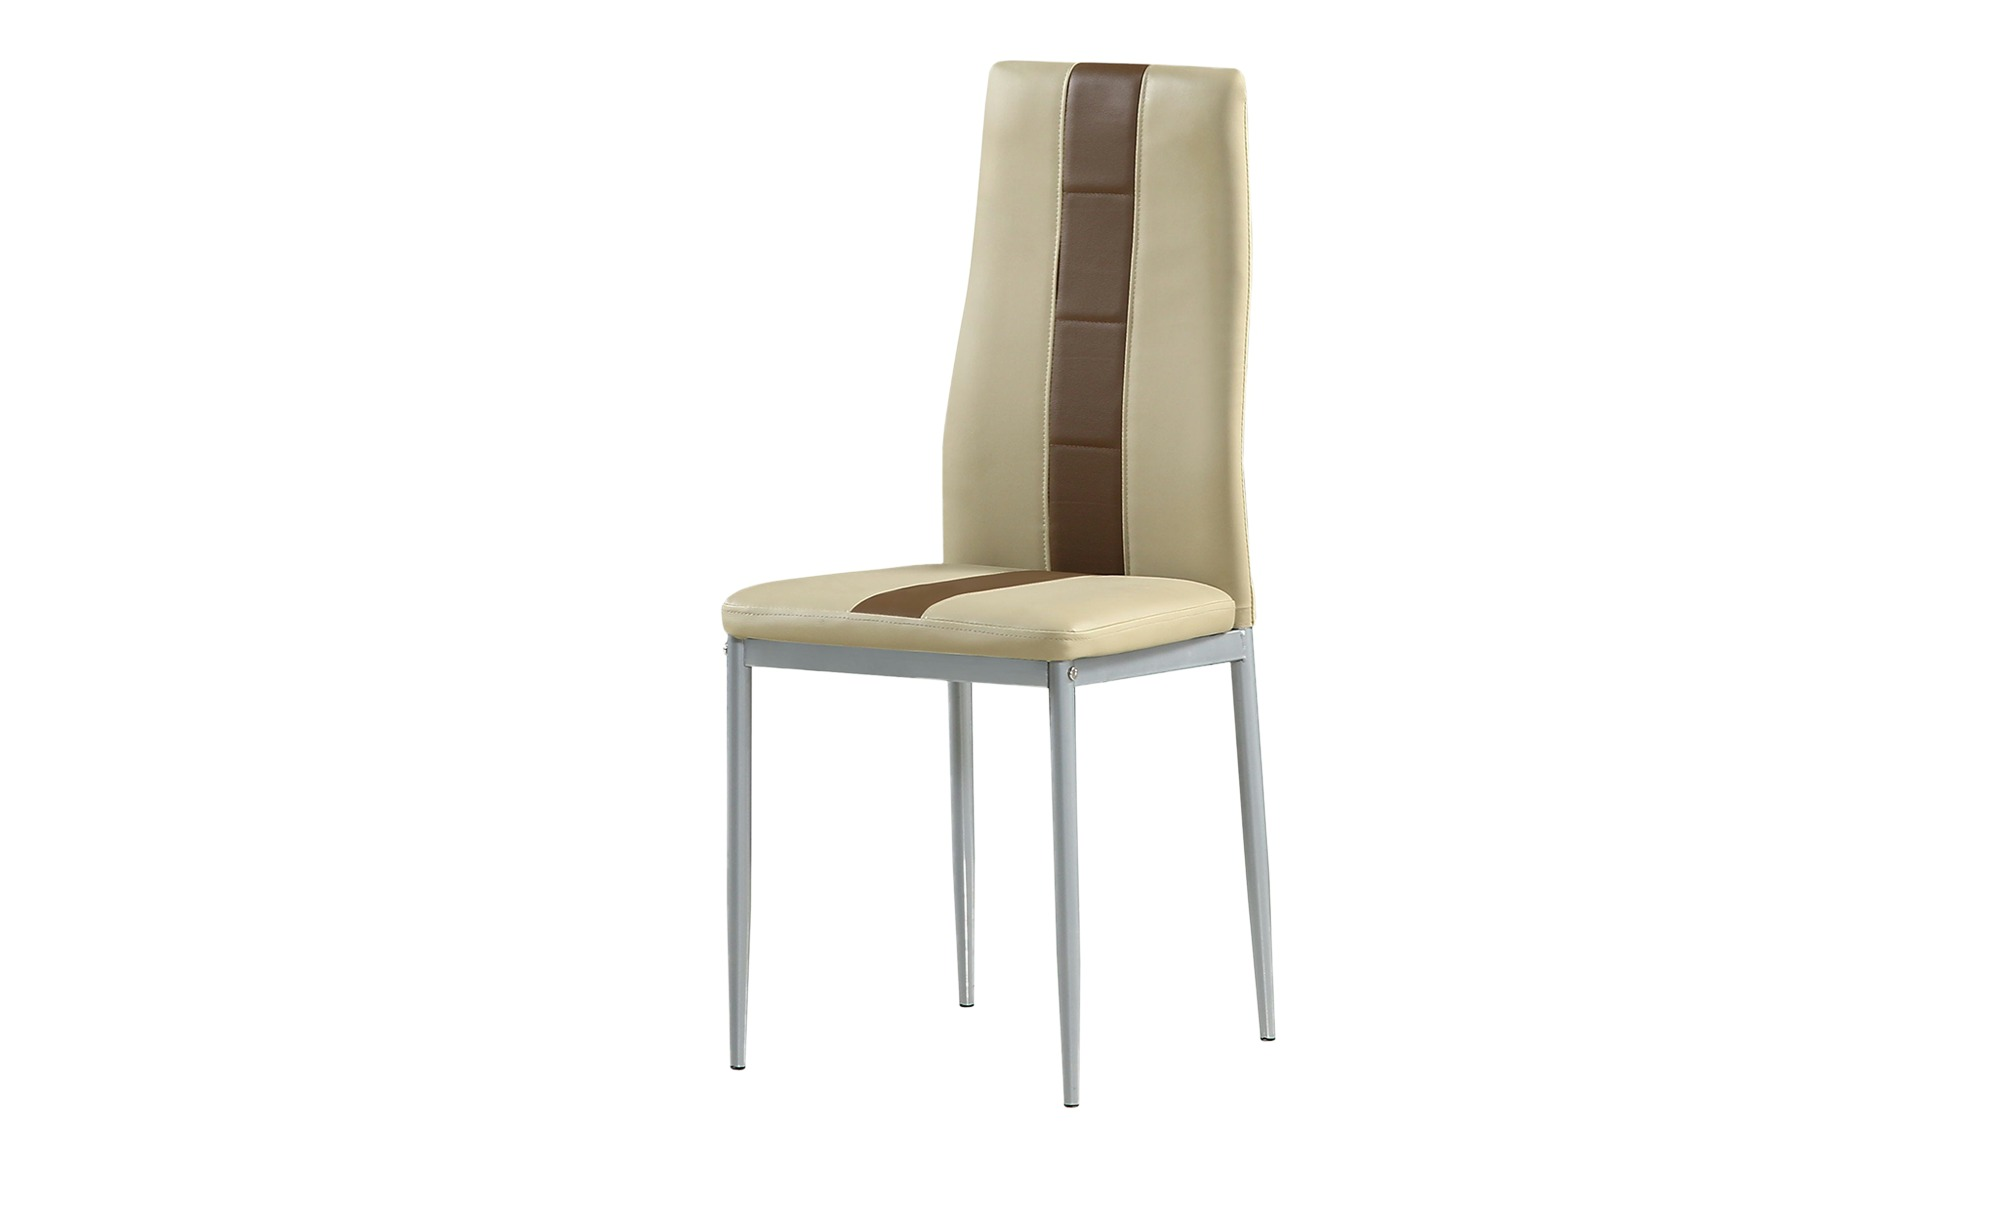 Stuhl lilaviolett 52 cm 83 cm 60 cm Sconto